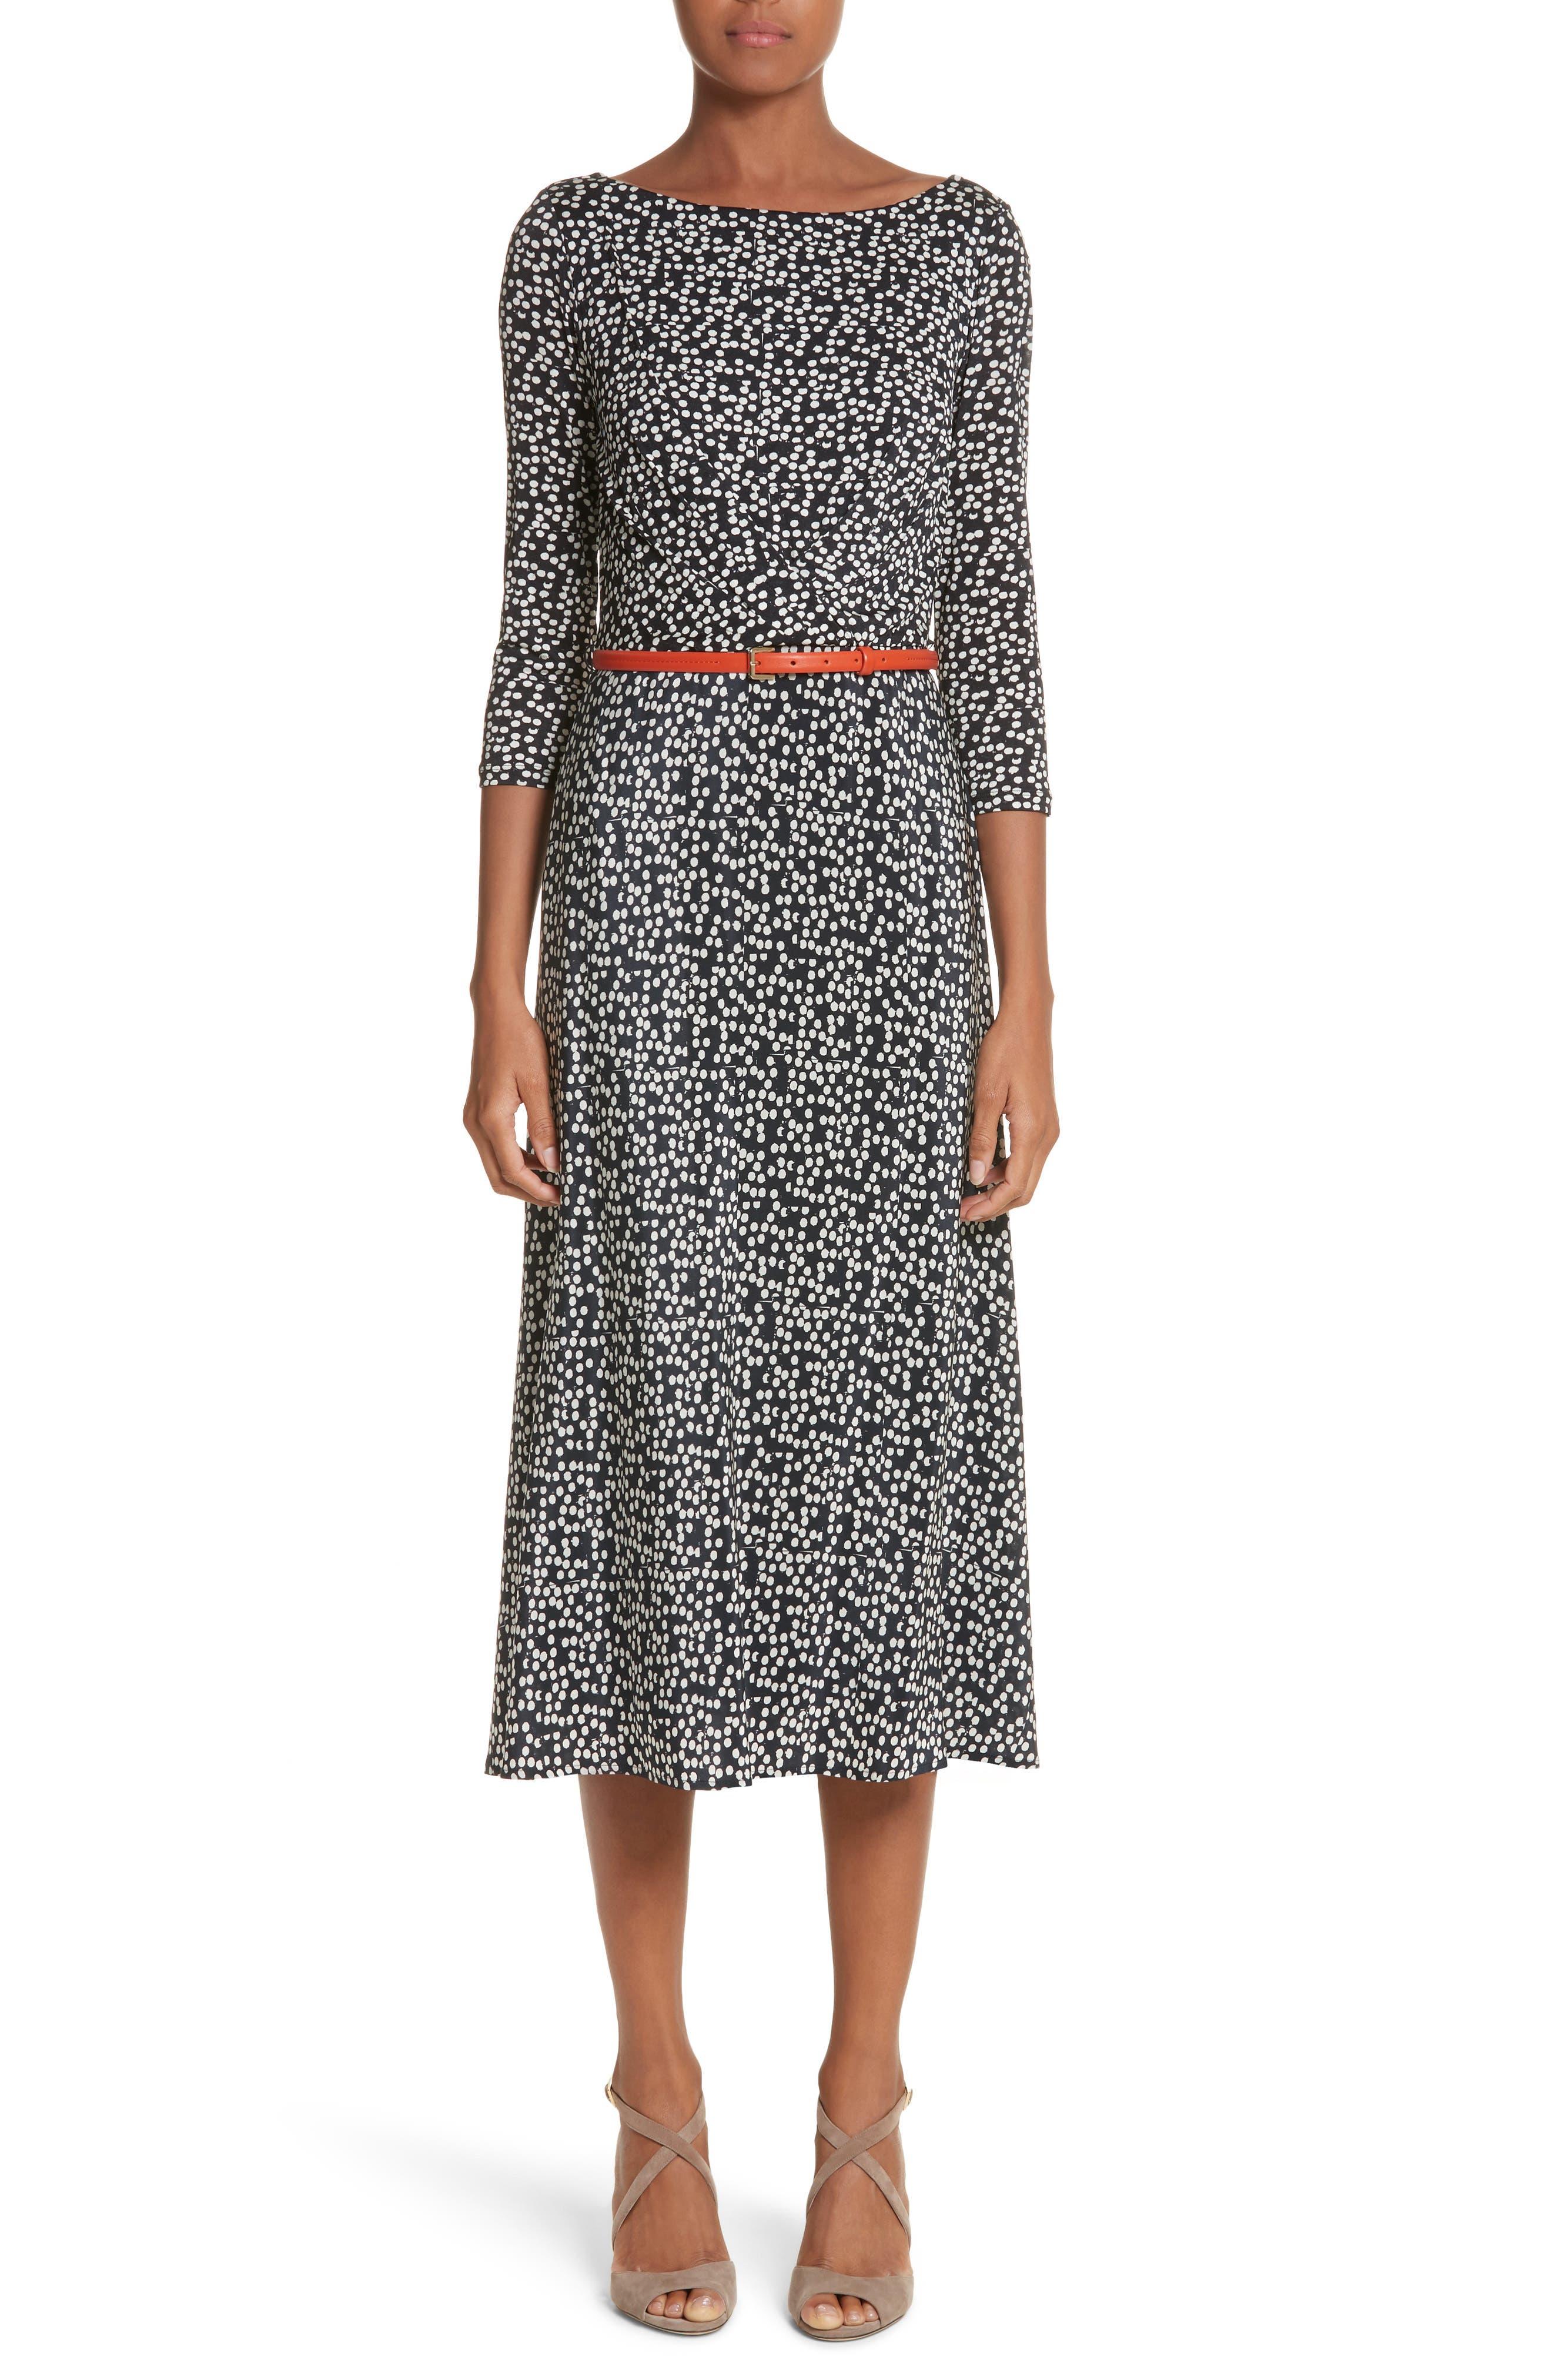 Peter Dot Print Midi Dress,                         Main,                         color, 001